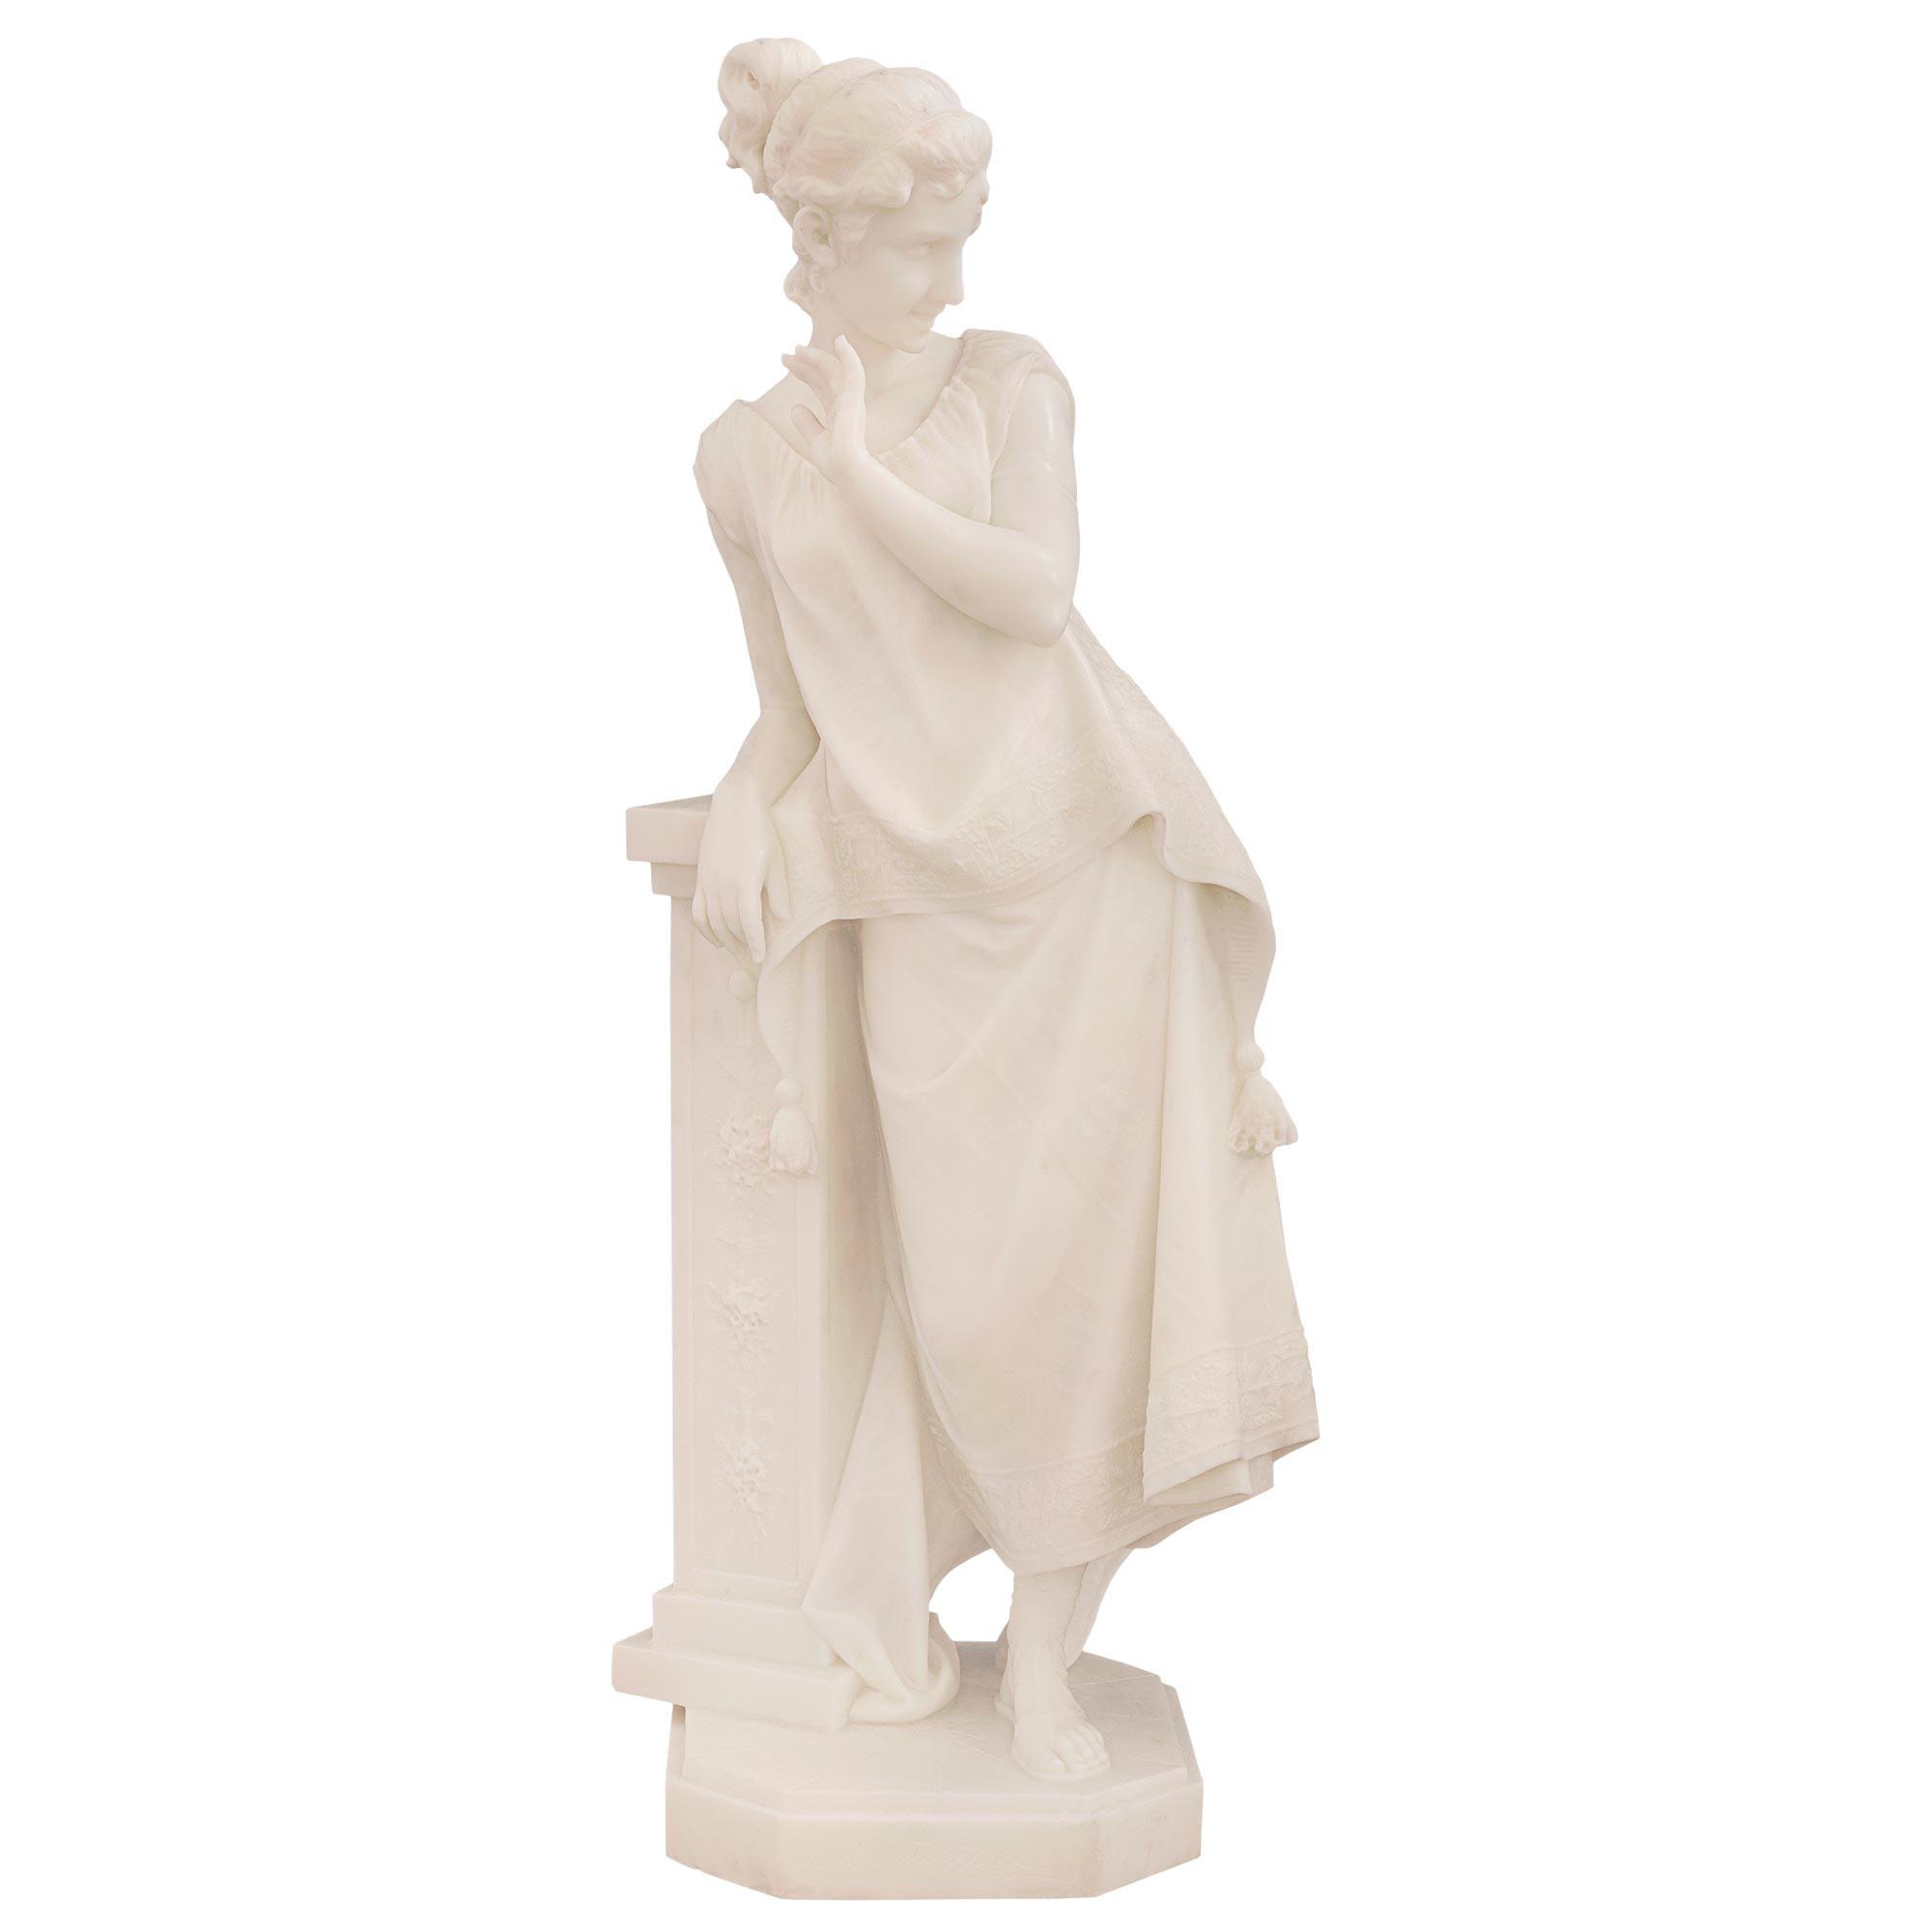 Italian 19th Century White Carrara Marble Statue of a Beautiful Maiden